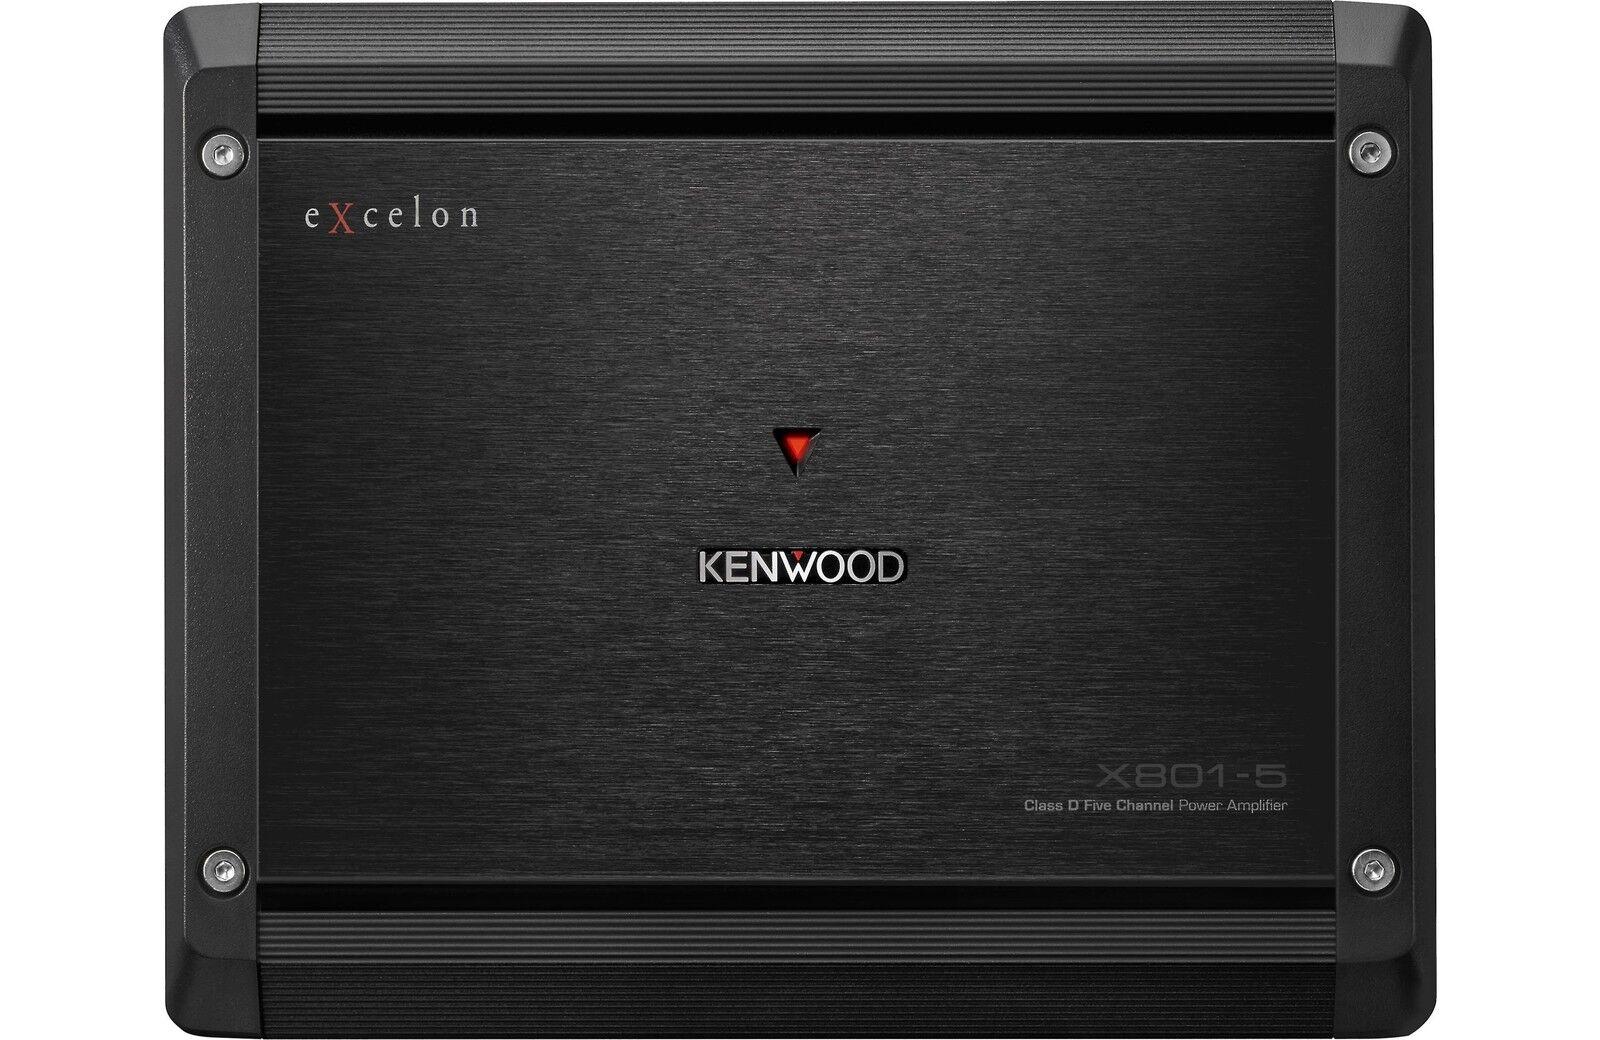 Kenwood Excelon X801 5 Channel Car Amplifier Ebay Rockford Fosgate R600x5 600w With Wiring Kit